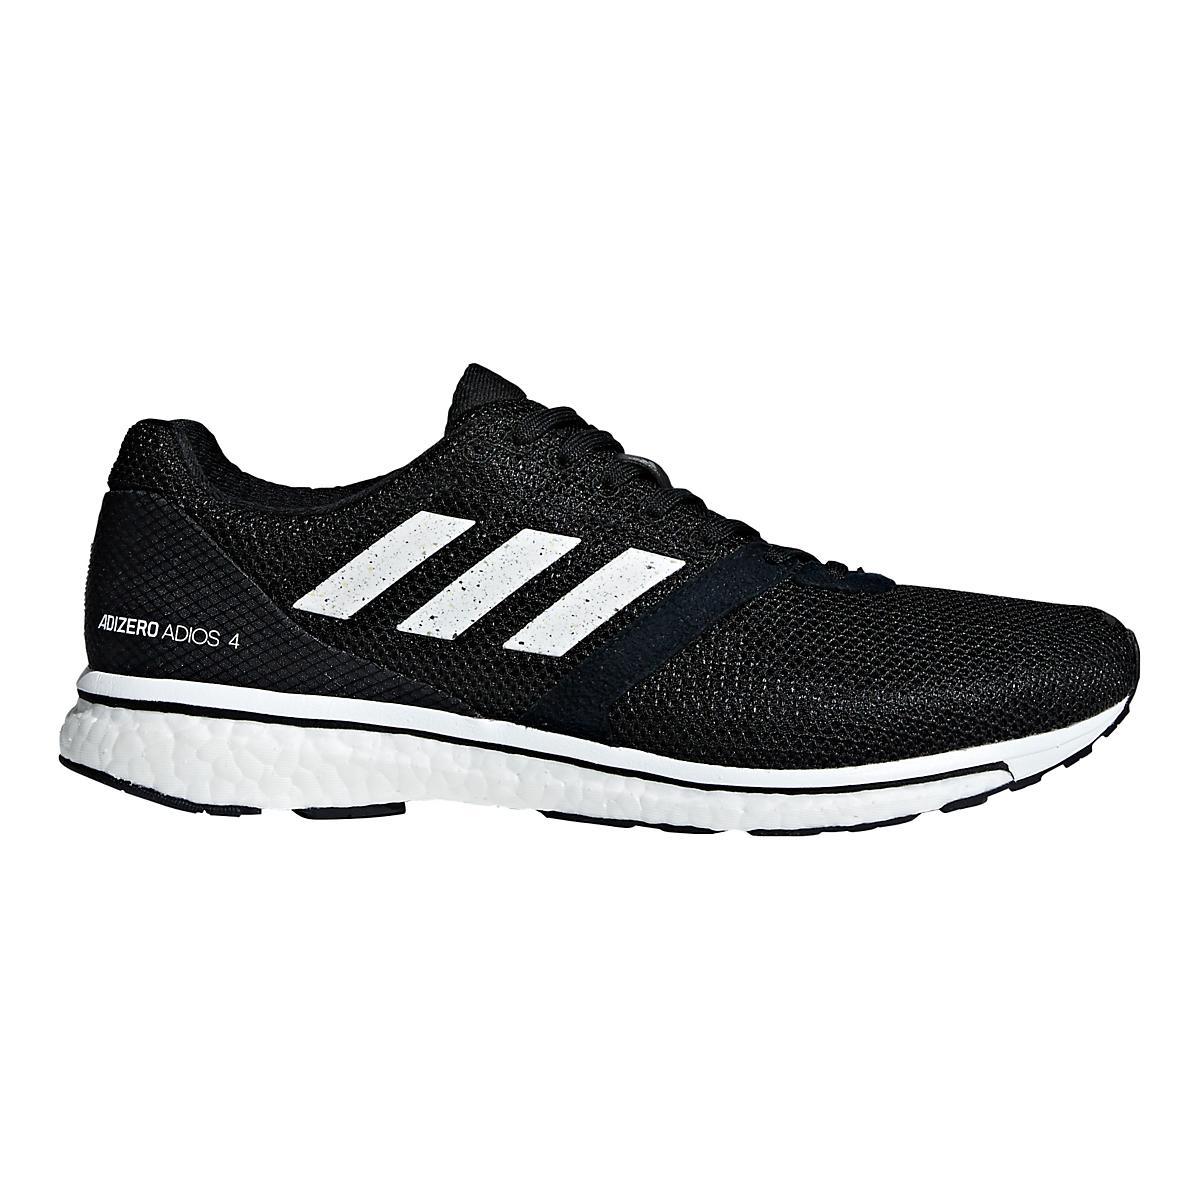 df68b4e5628 Mens adidas Adizero Adios 4 Running Shoe at Road Runner Sports